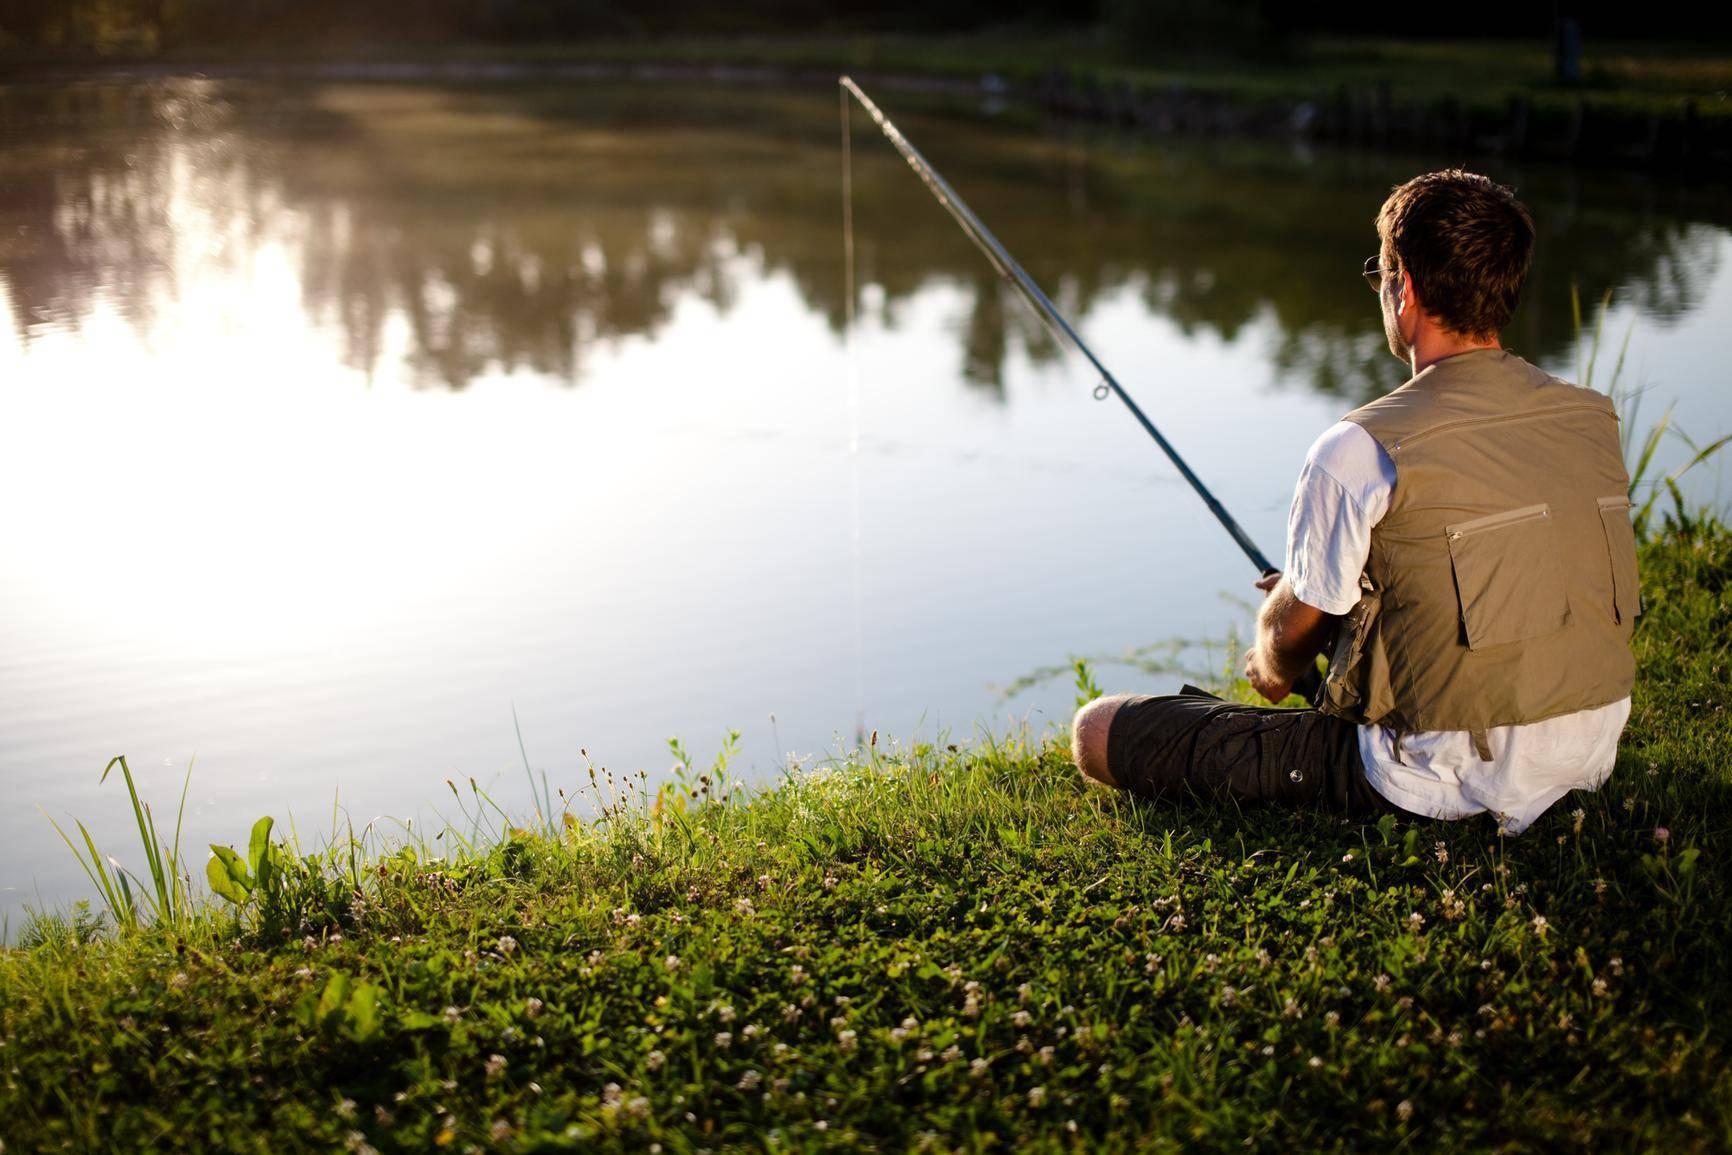 Toyota land cruiser -=brownstone 320hp=- › бортжурнал › первый раз в жизни на настоящую рыбалку!